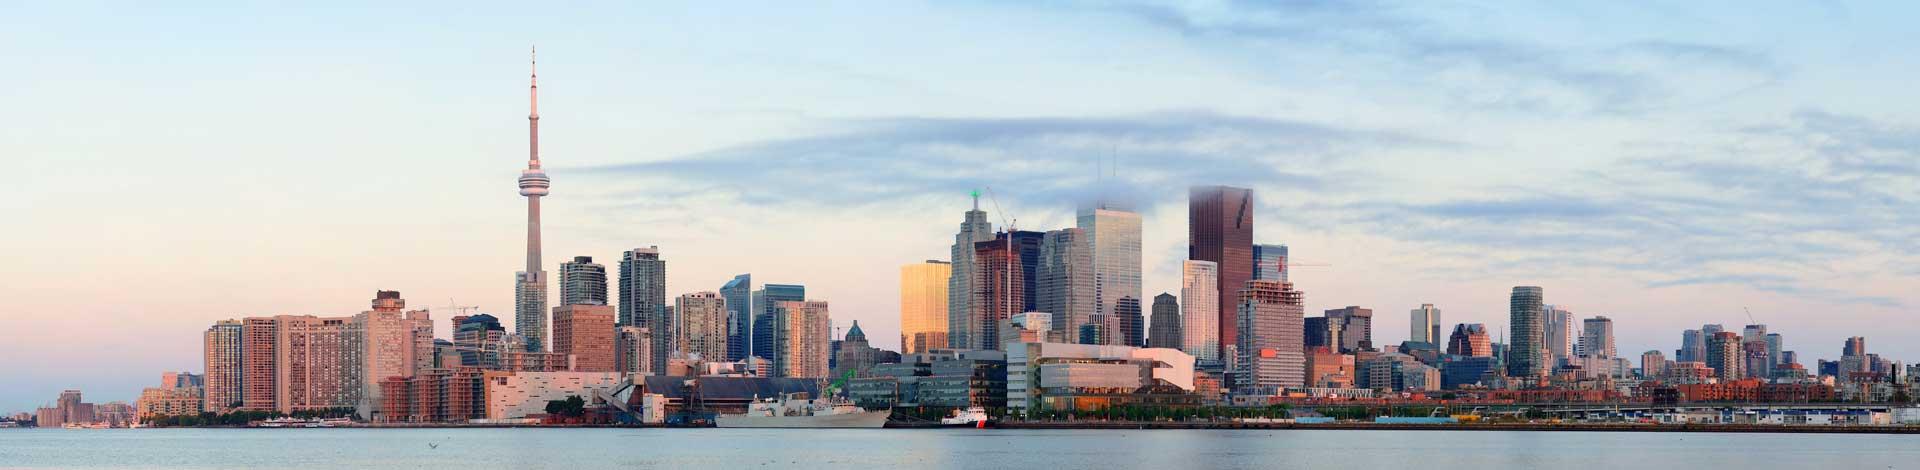 Toronto-Background-1920x470px